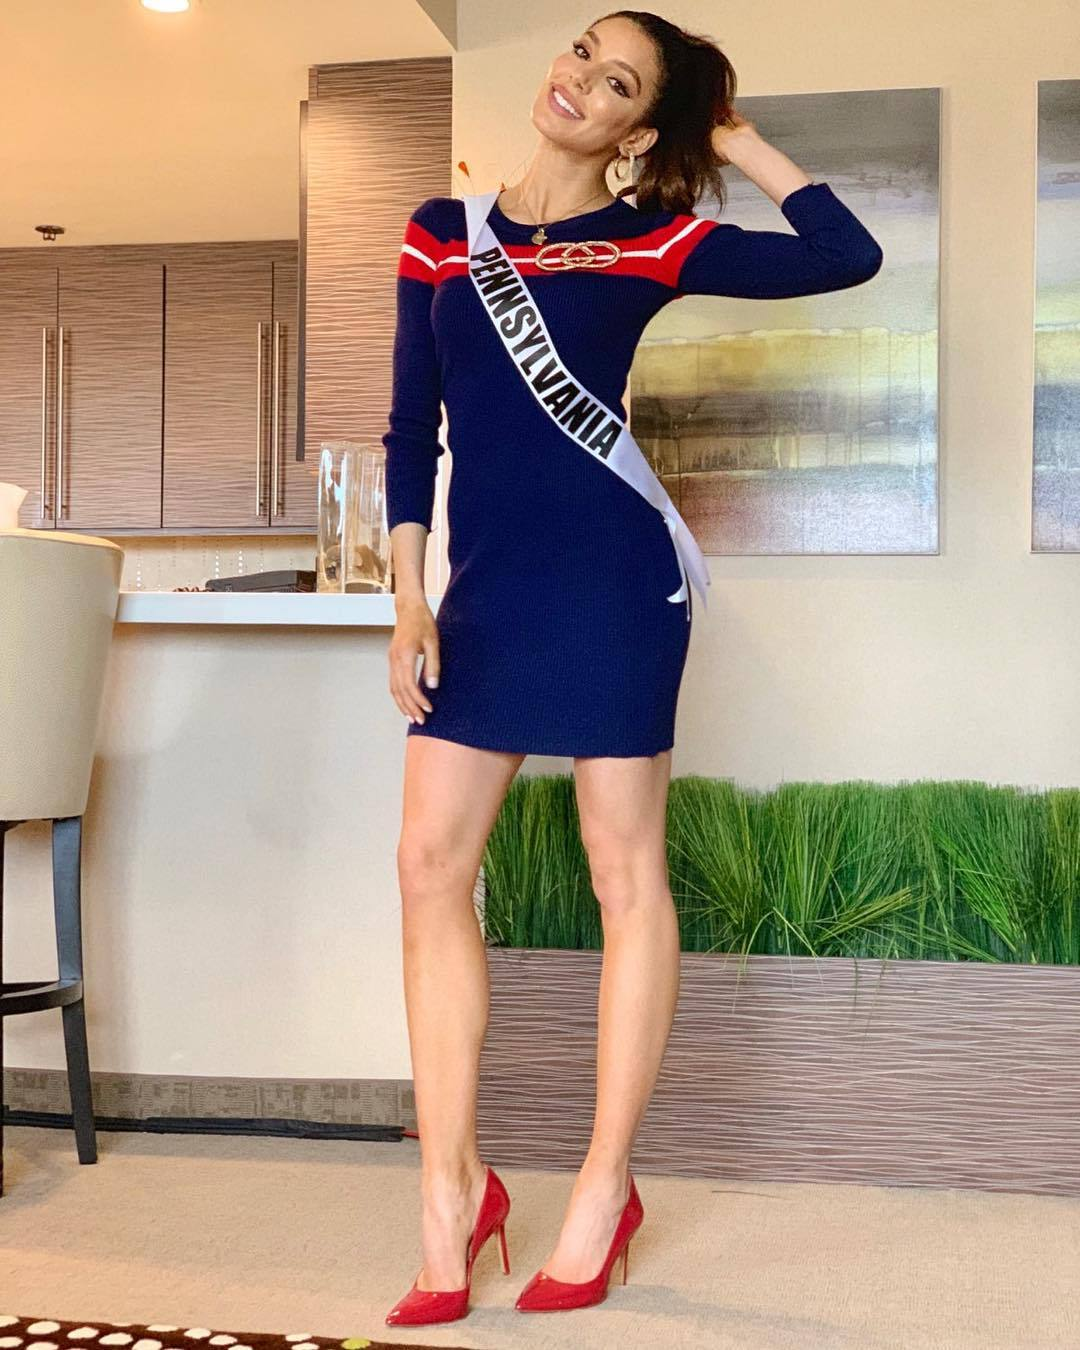 kailyn marie perez, miss pennsylvania 2019. - Página 7 56666978_440658539834681_3621217283425775998_n